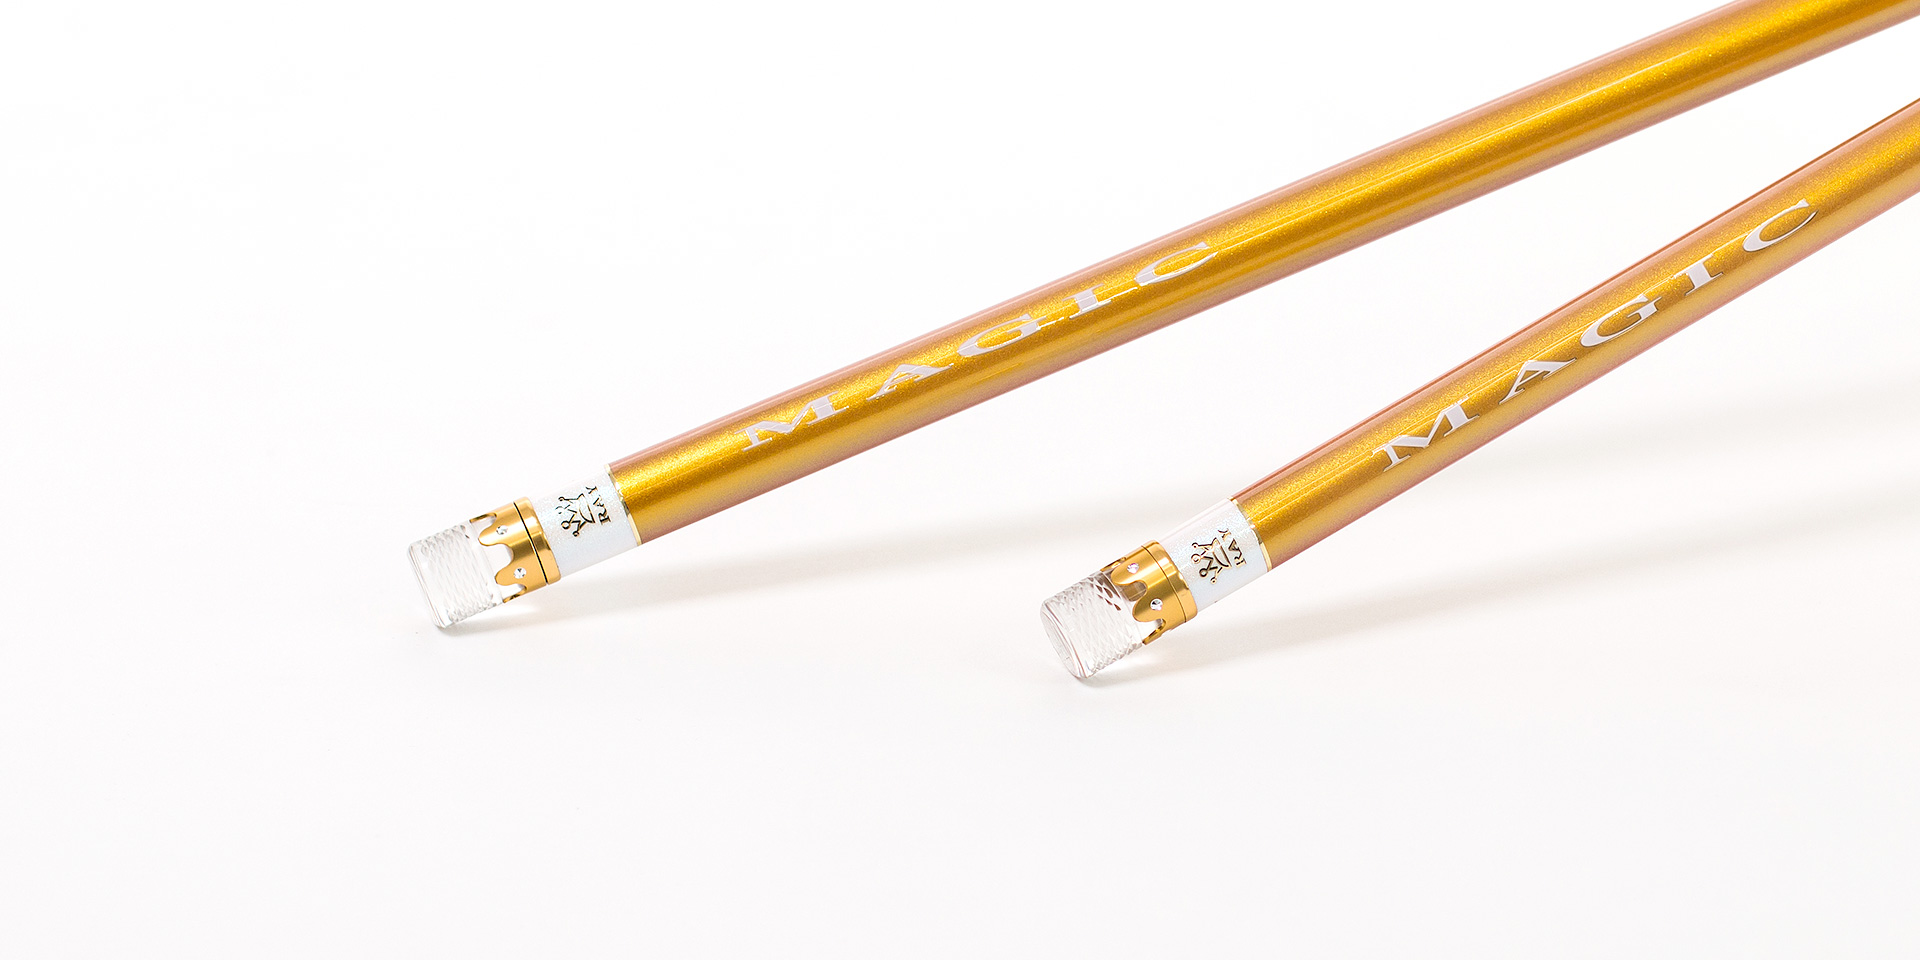 MAGIC主题设计元素,搭配合金嵌钻水晶前堵,更显品质高雅